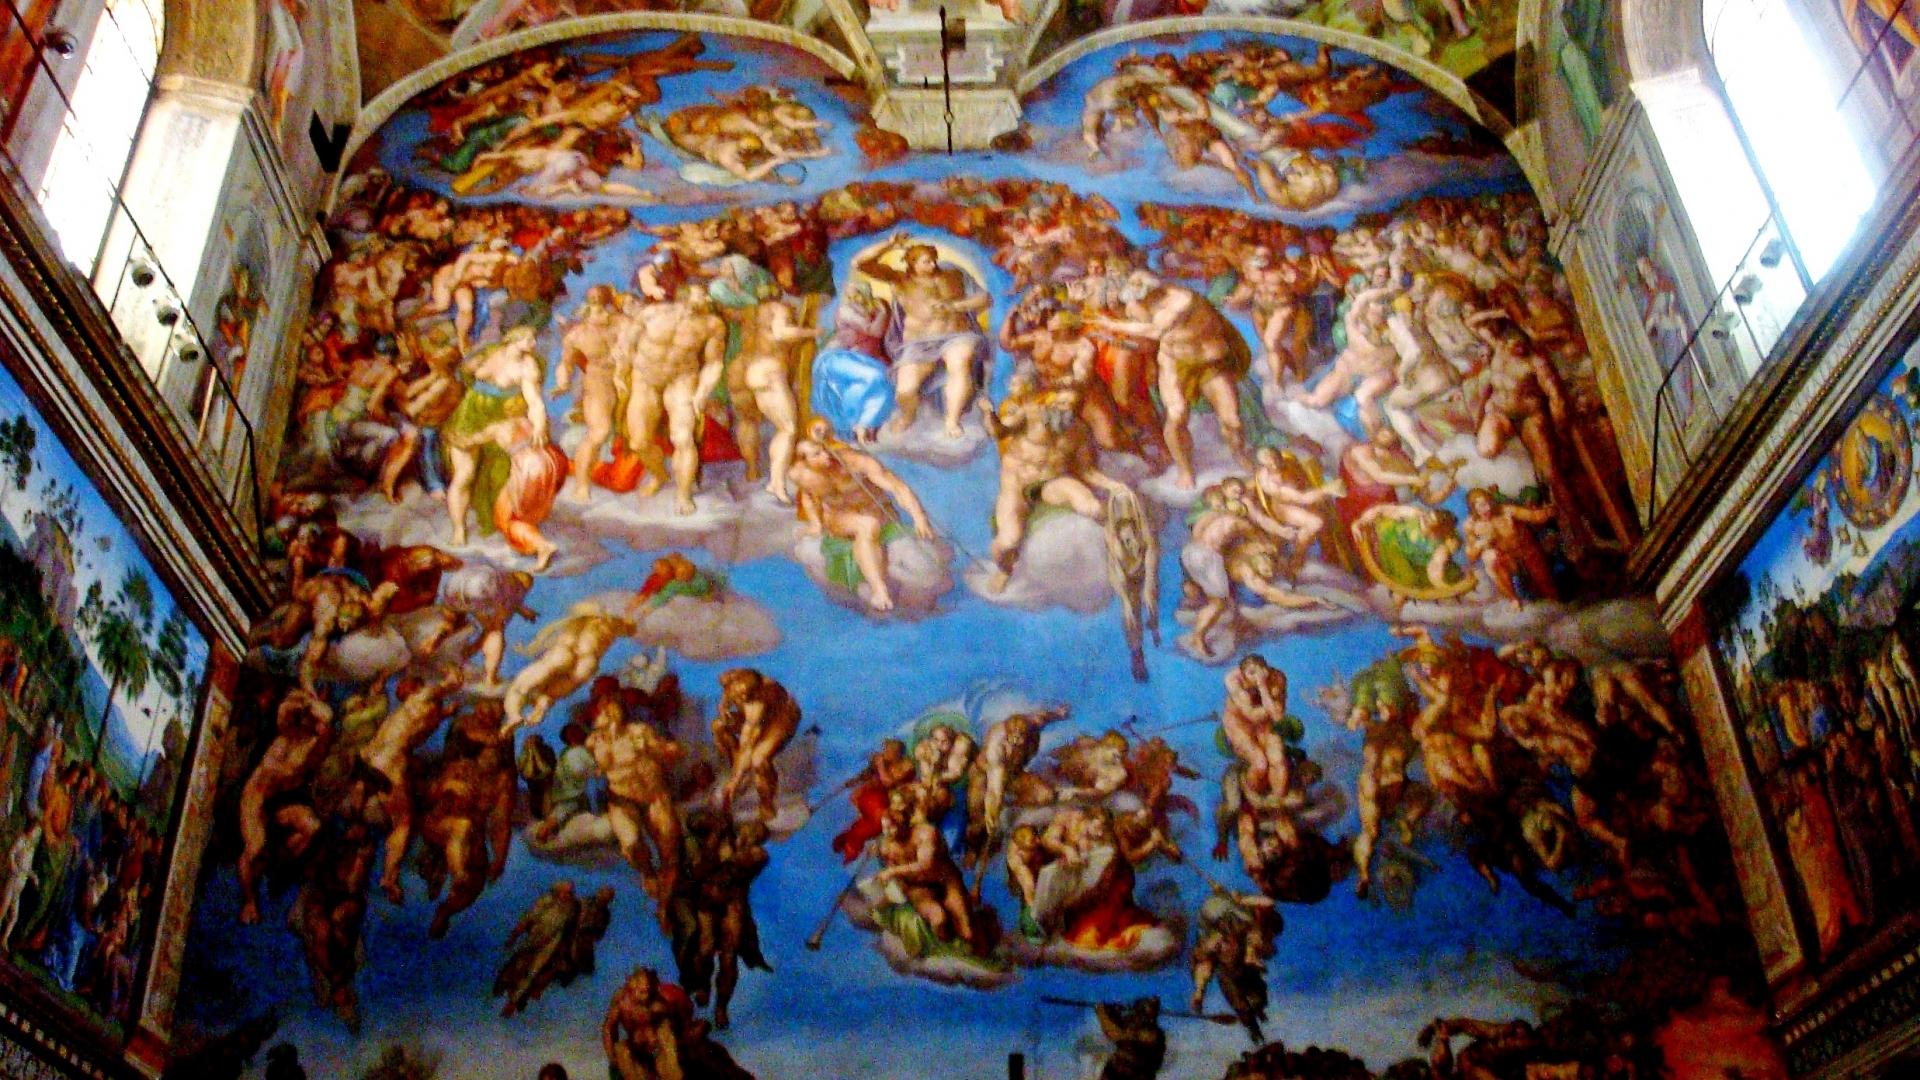 Download Pin Sistine Chapel Ceiling Wallpaper [2473x1855] 47 1920x1080